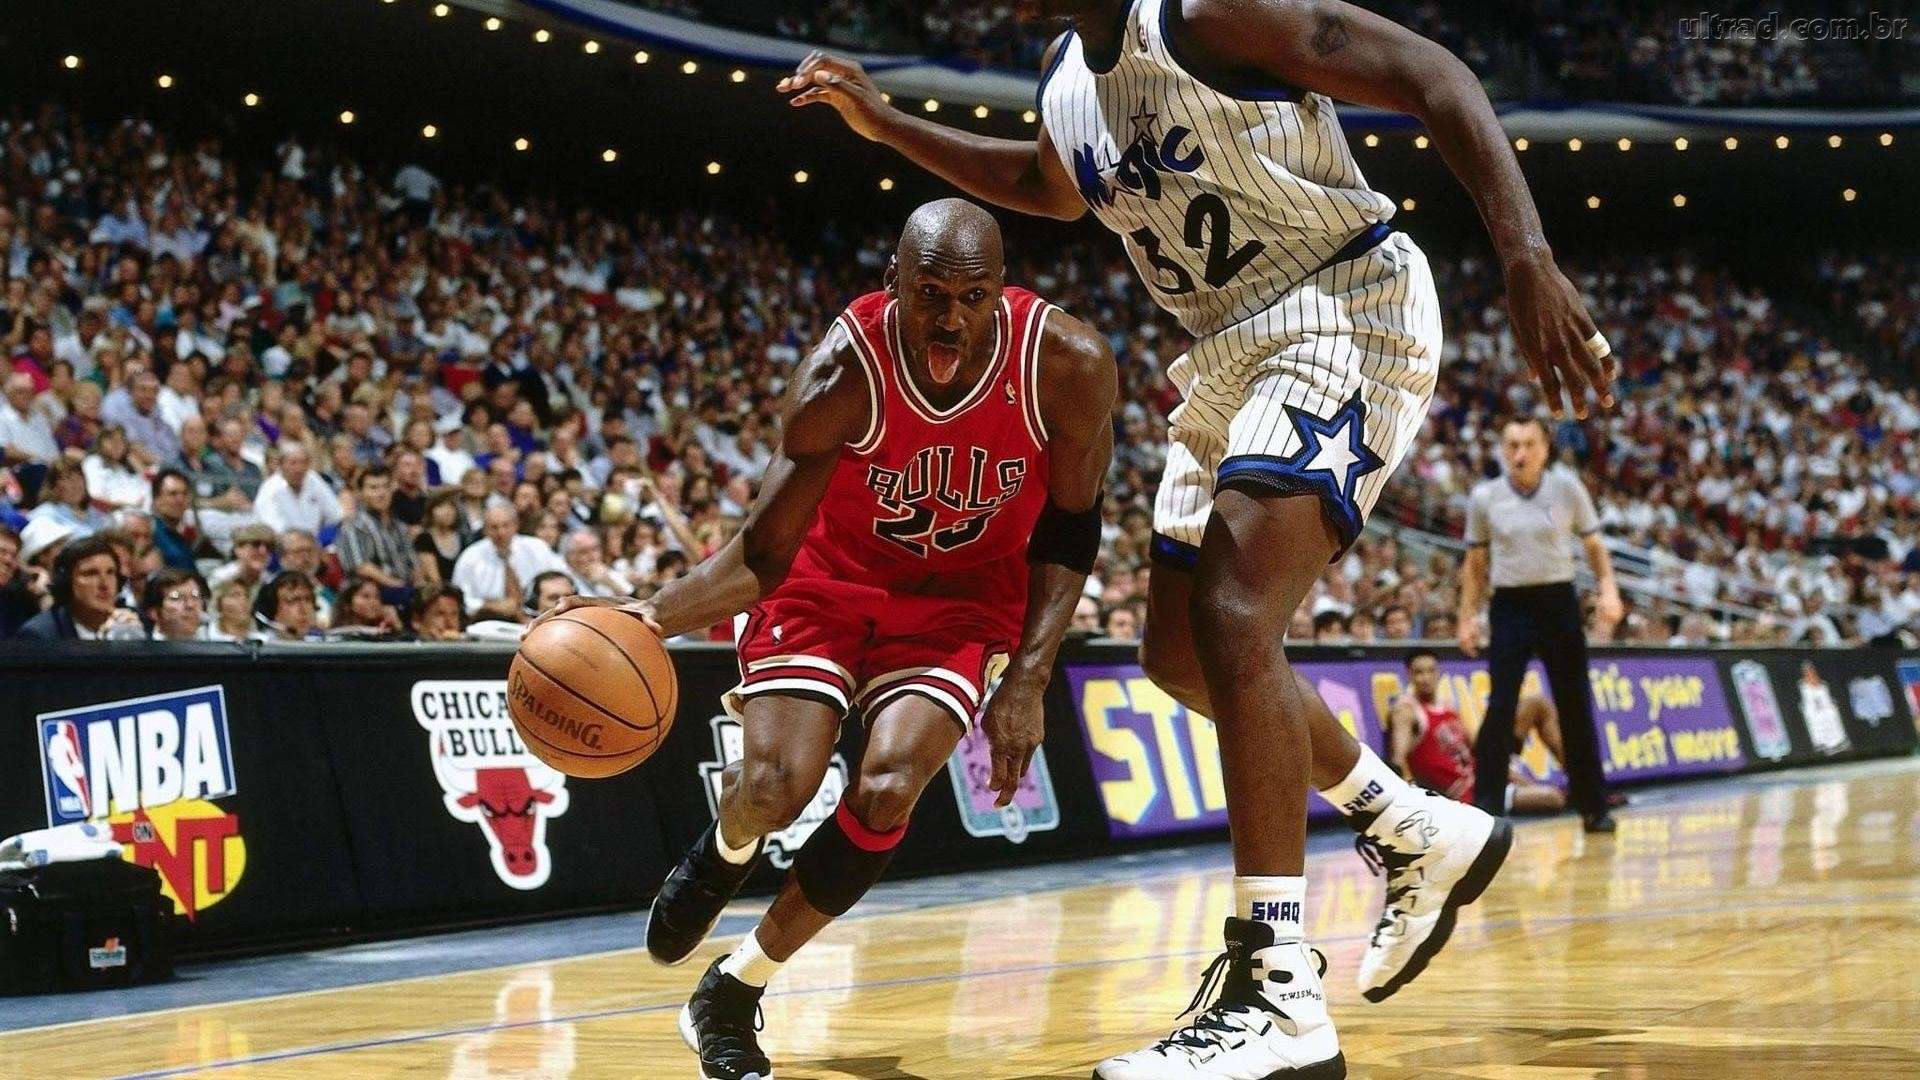 Michael Jordan Wallpaper Scottie Pippen Dennis Rodman Nba Basketball